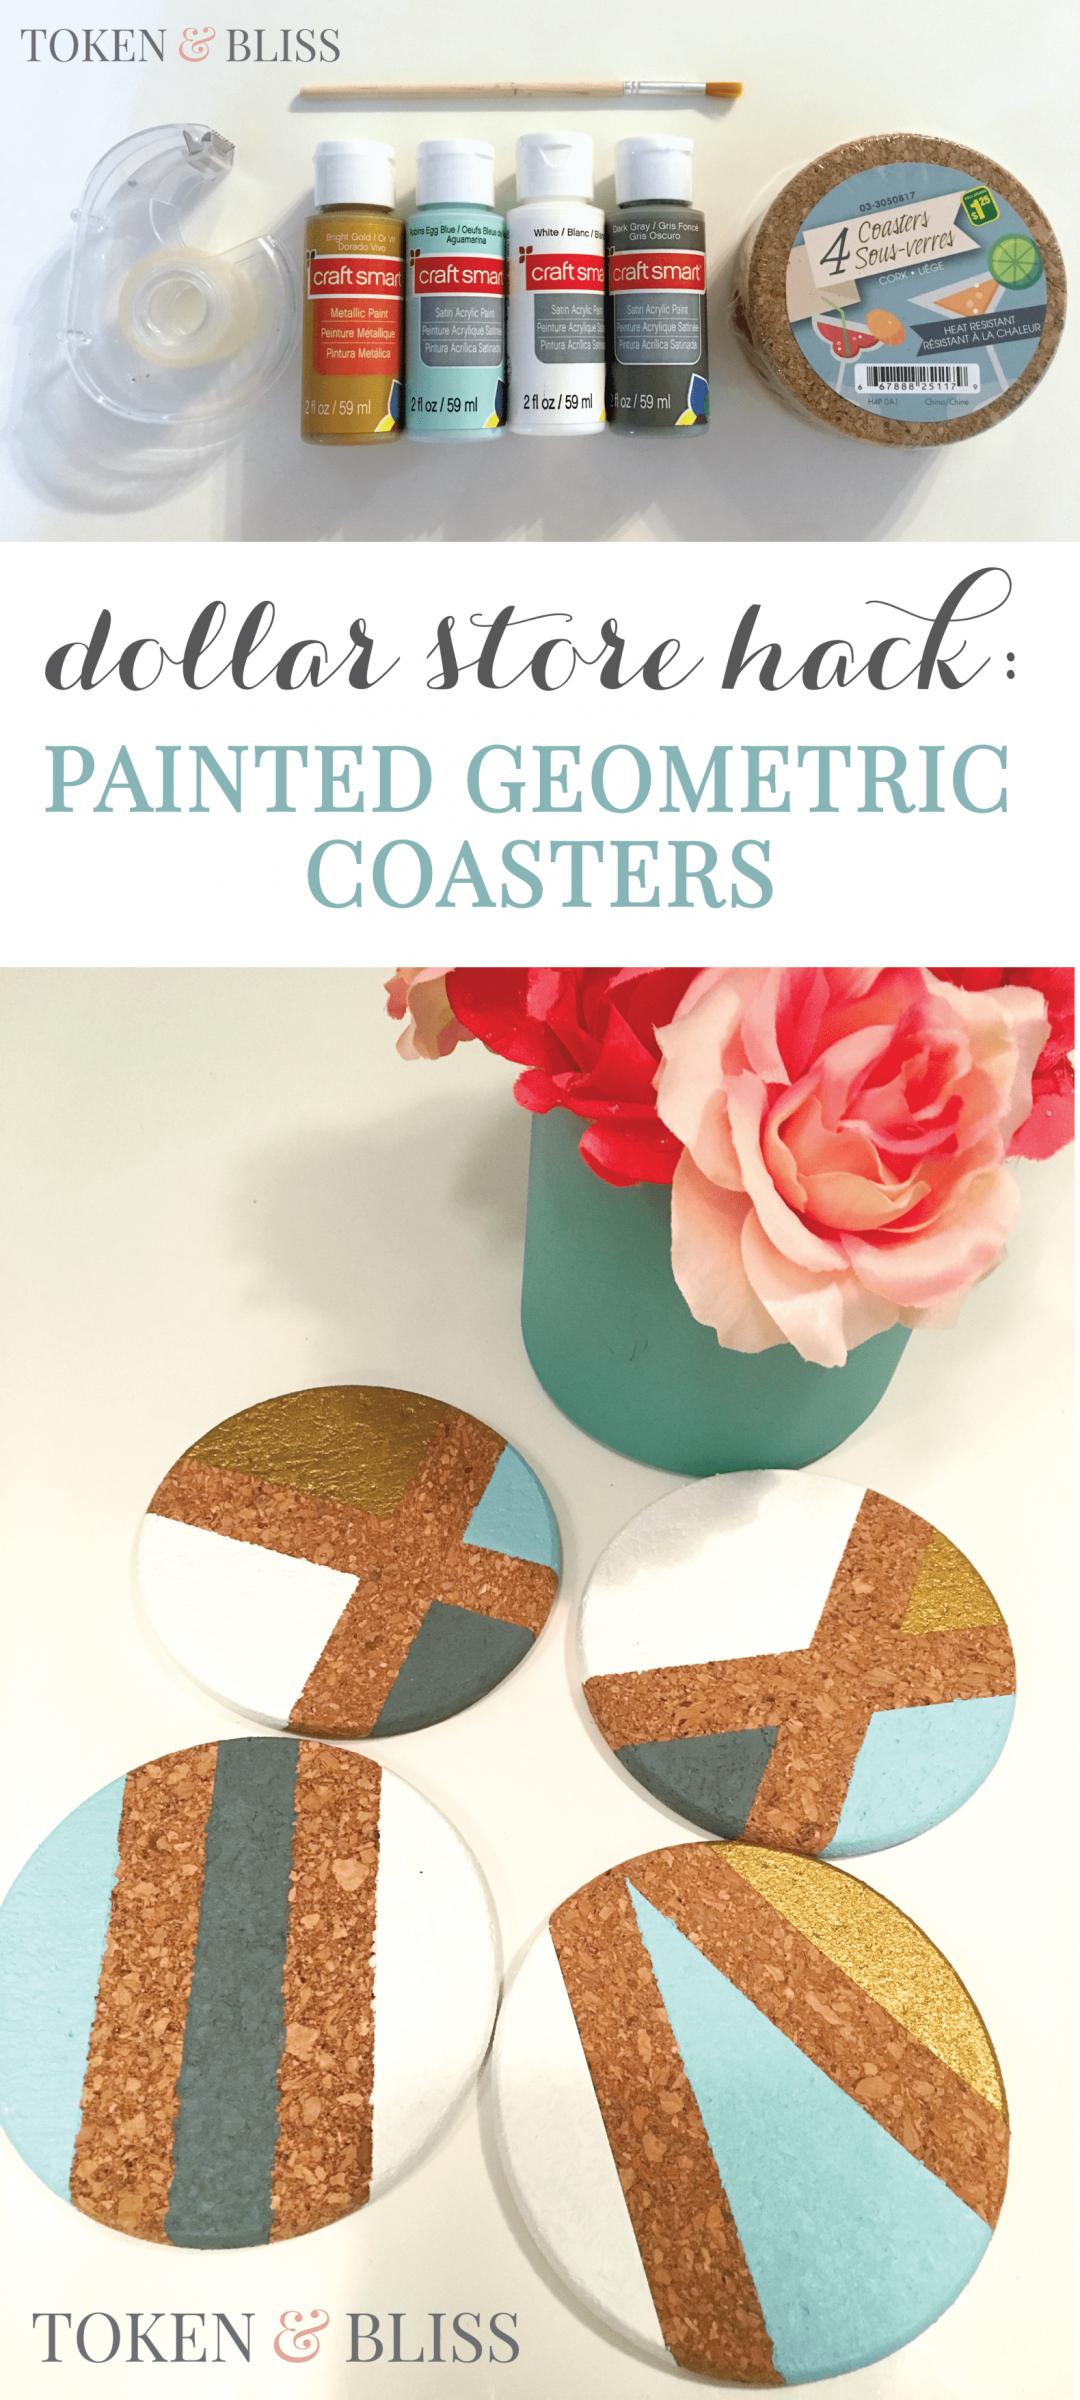 Dollar Store Hack: DIY Painted Geometric Cork Coasters #craftstomakeandsell